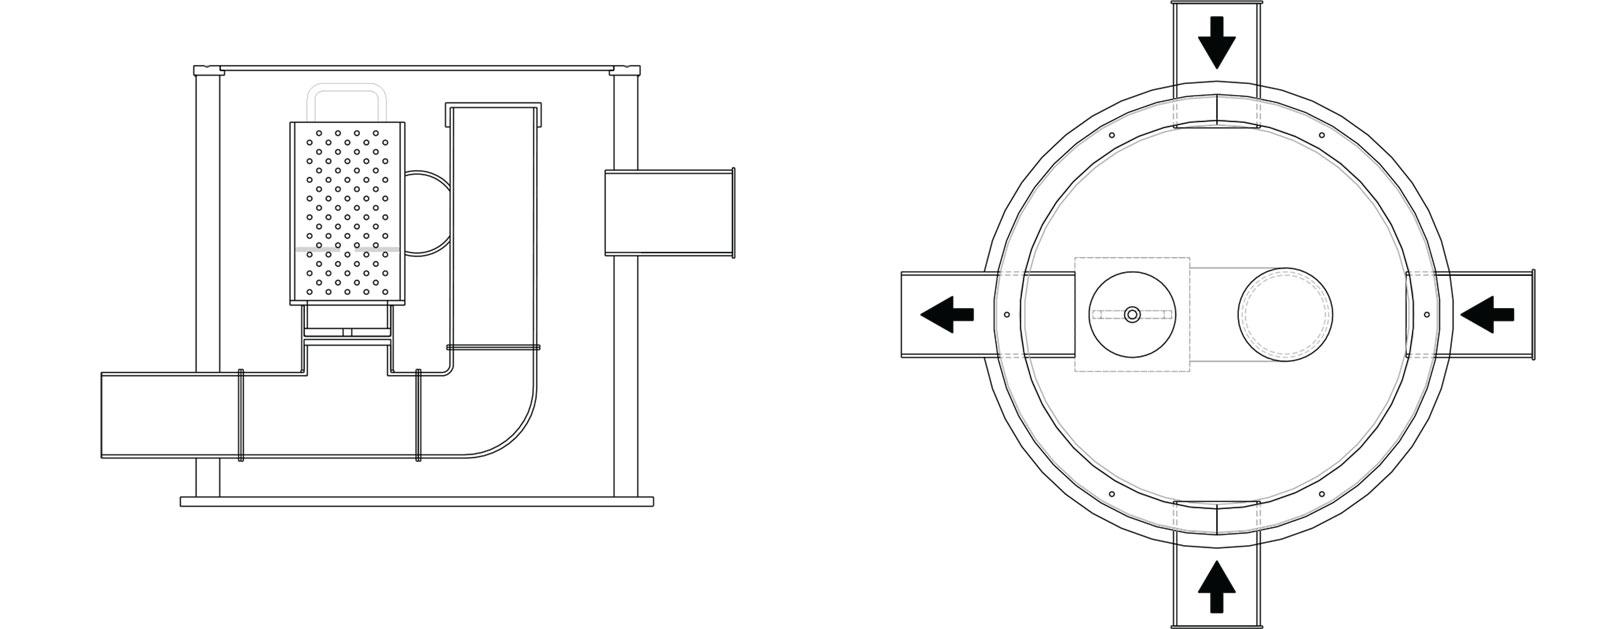 Controflow_ SUDS02008_dimensions